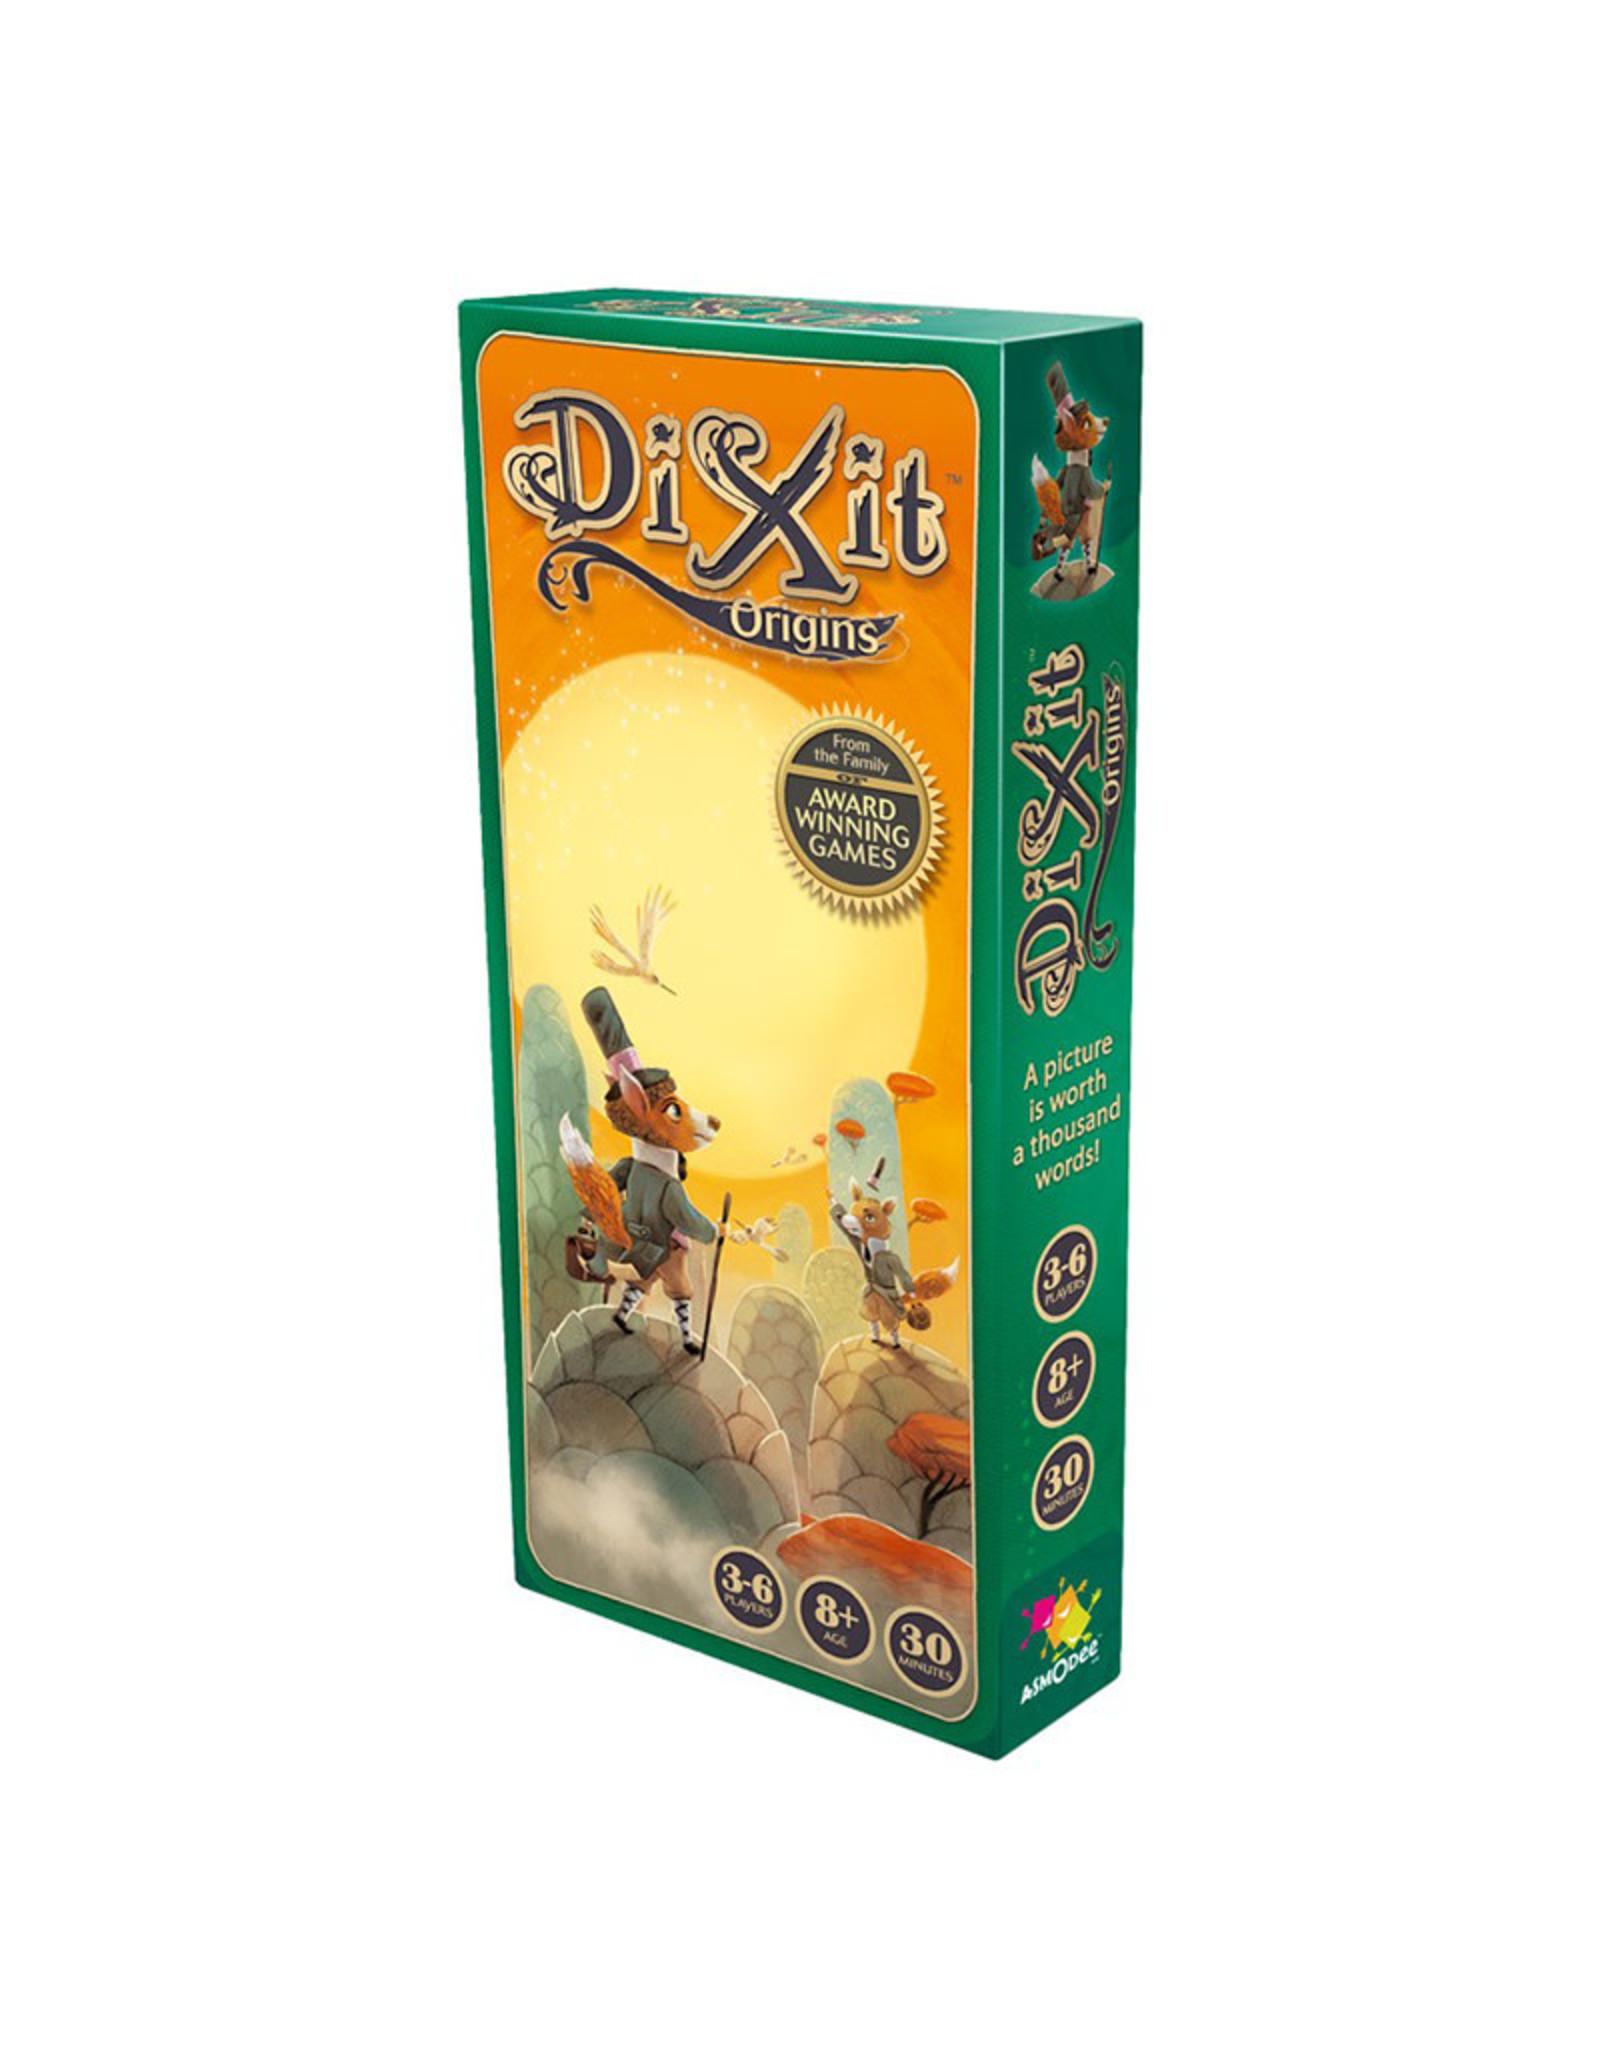 Dixit Origins Expansion